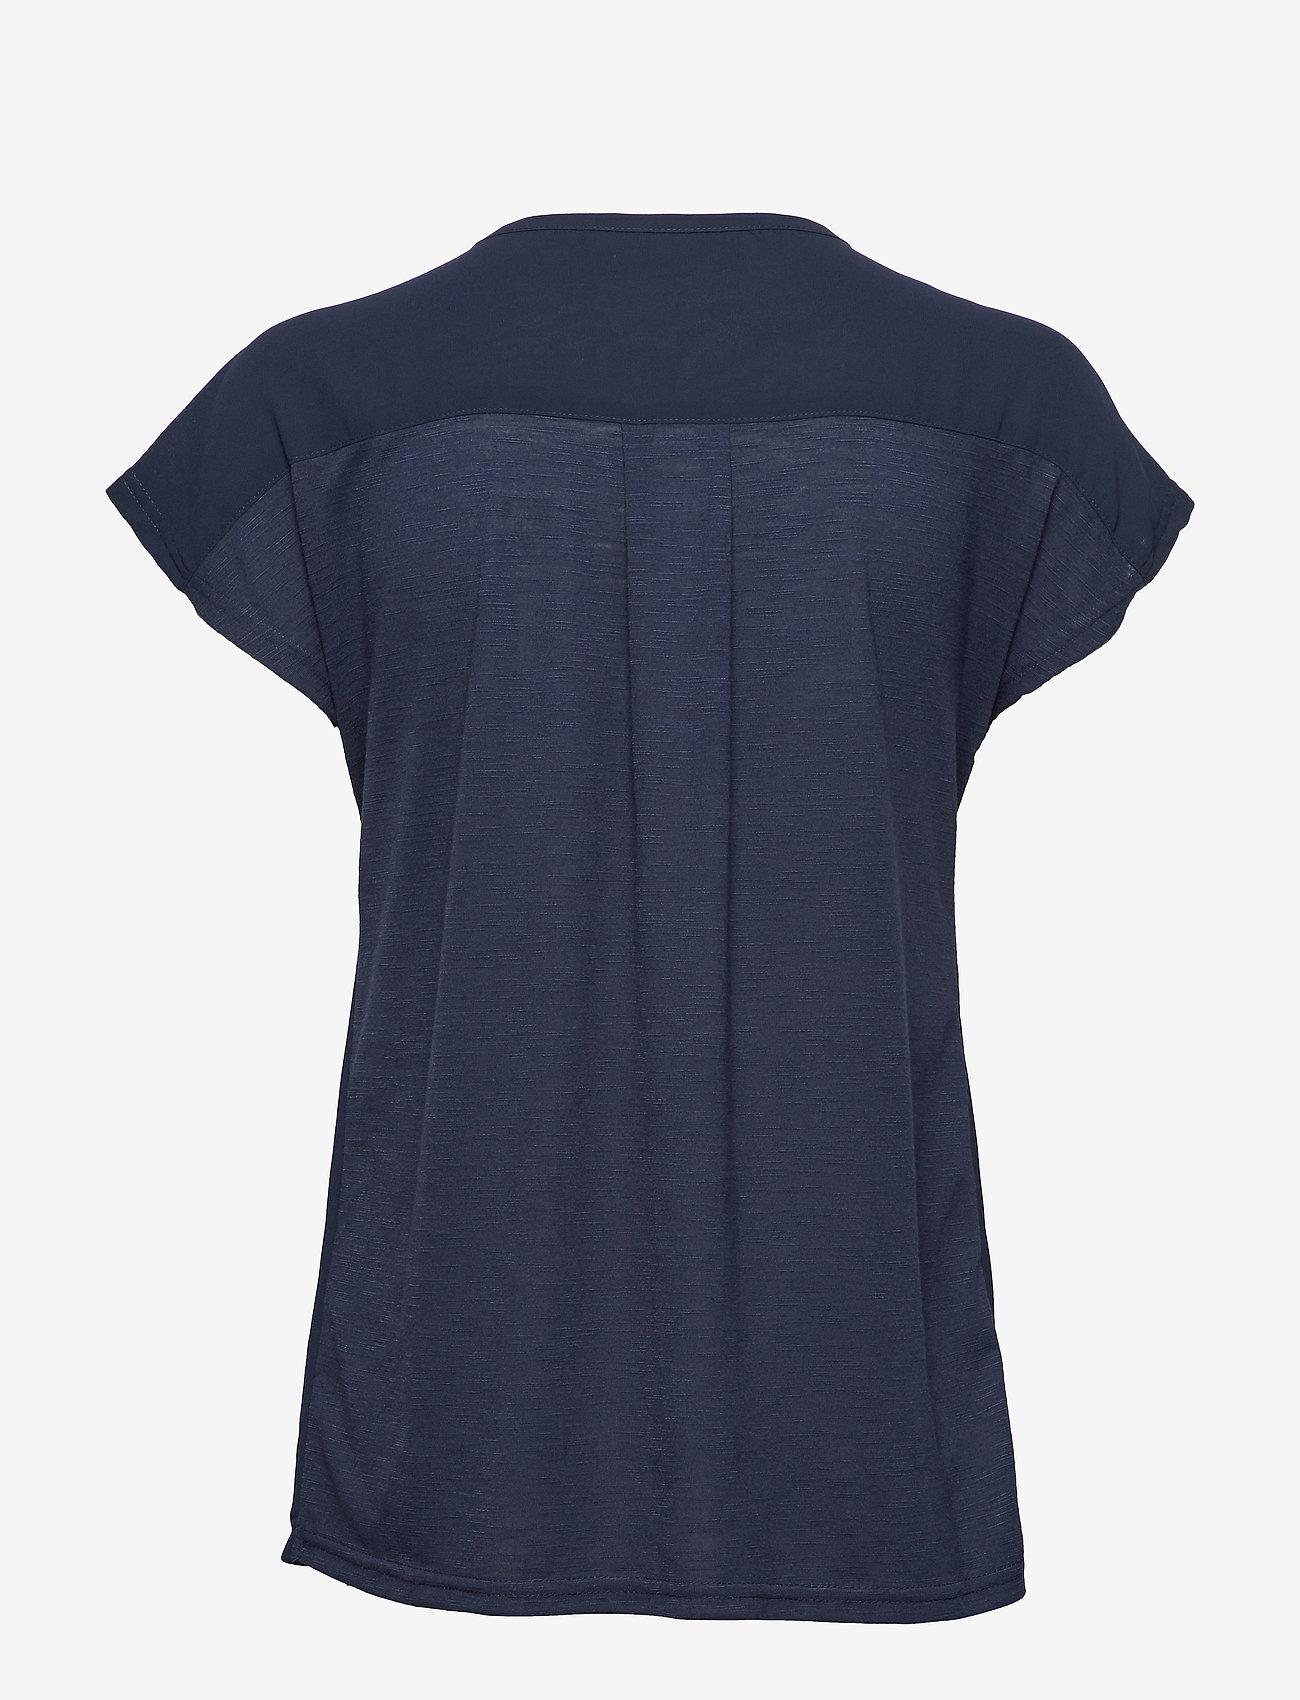 Fransa - Zawov 2 Blouse - t-shirts - black iris - 1